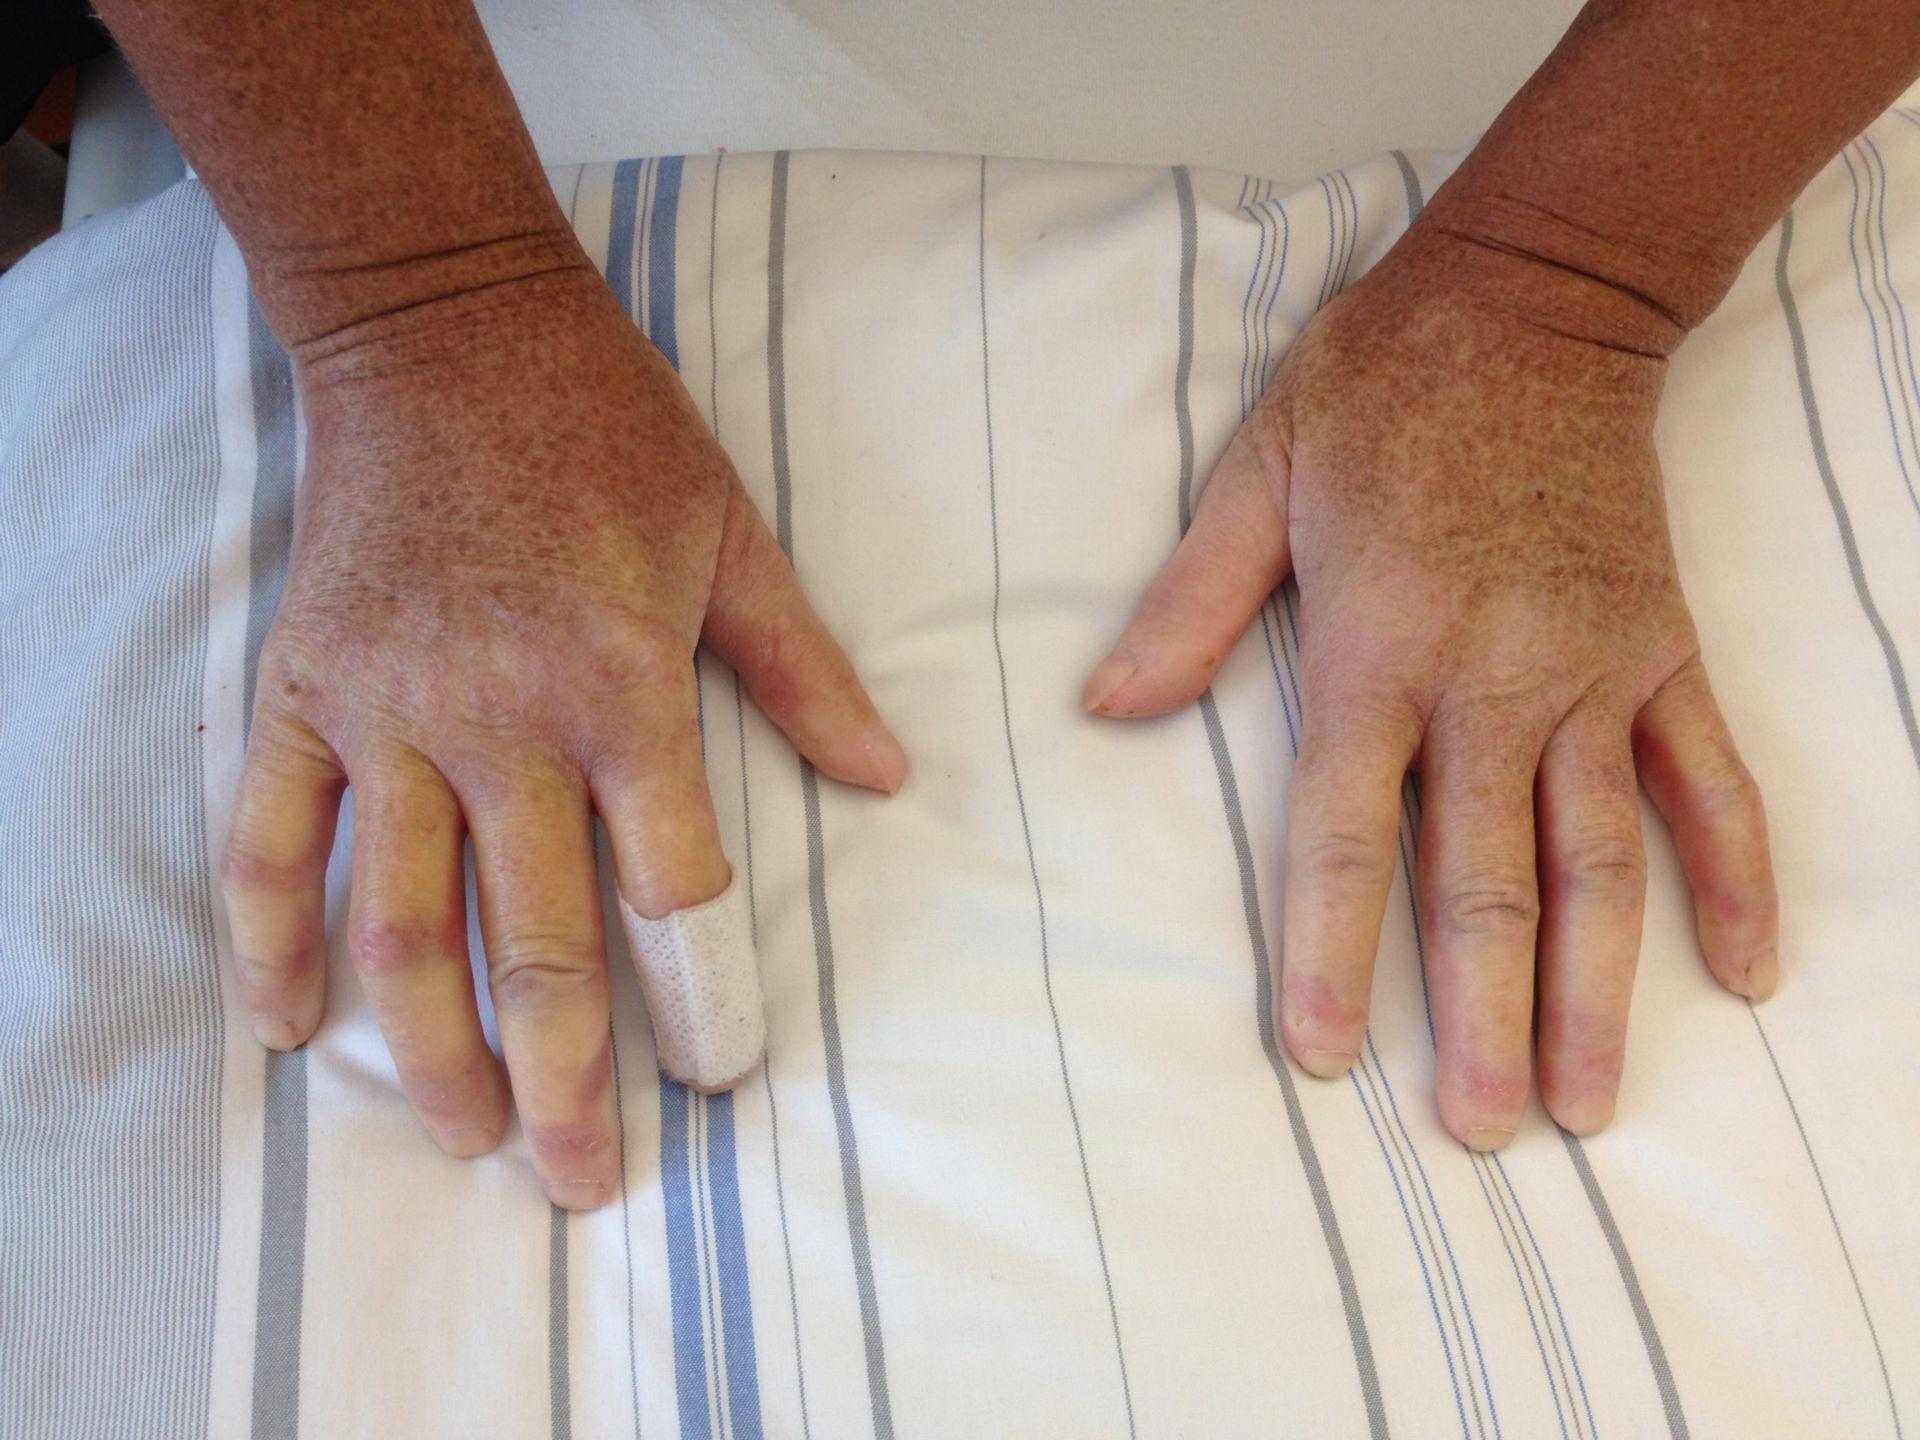 Sklerodaktylie und Raynaud-Symptomatik bei CREST-Syndrom (1/2)